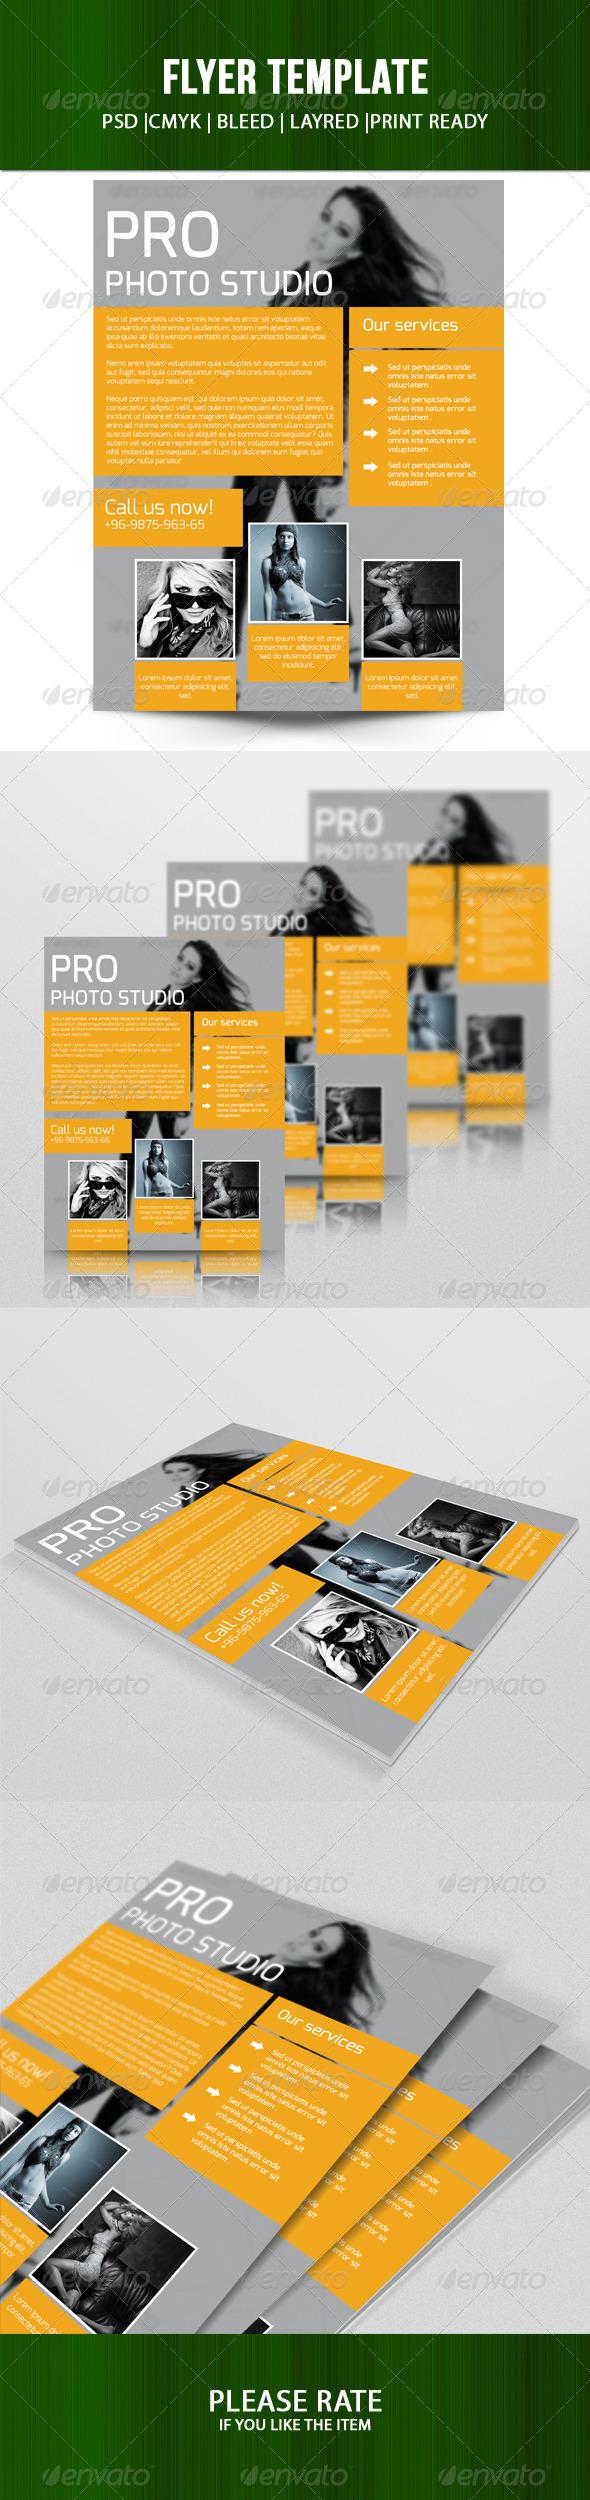 GraphicRiver Pro Photo Studio Flyer 7729919